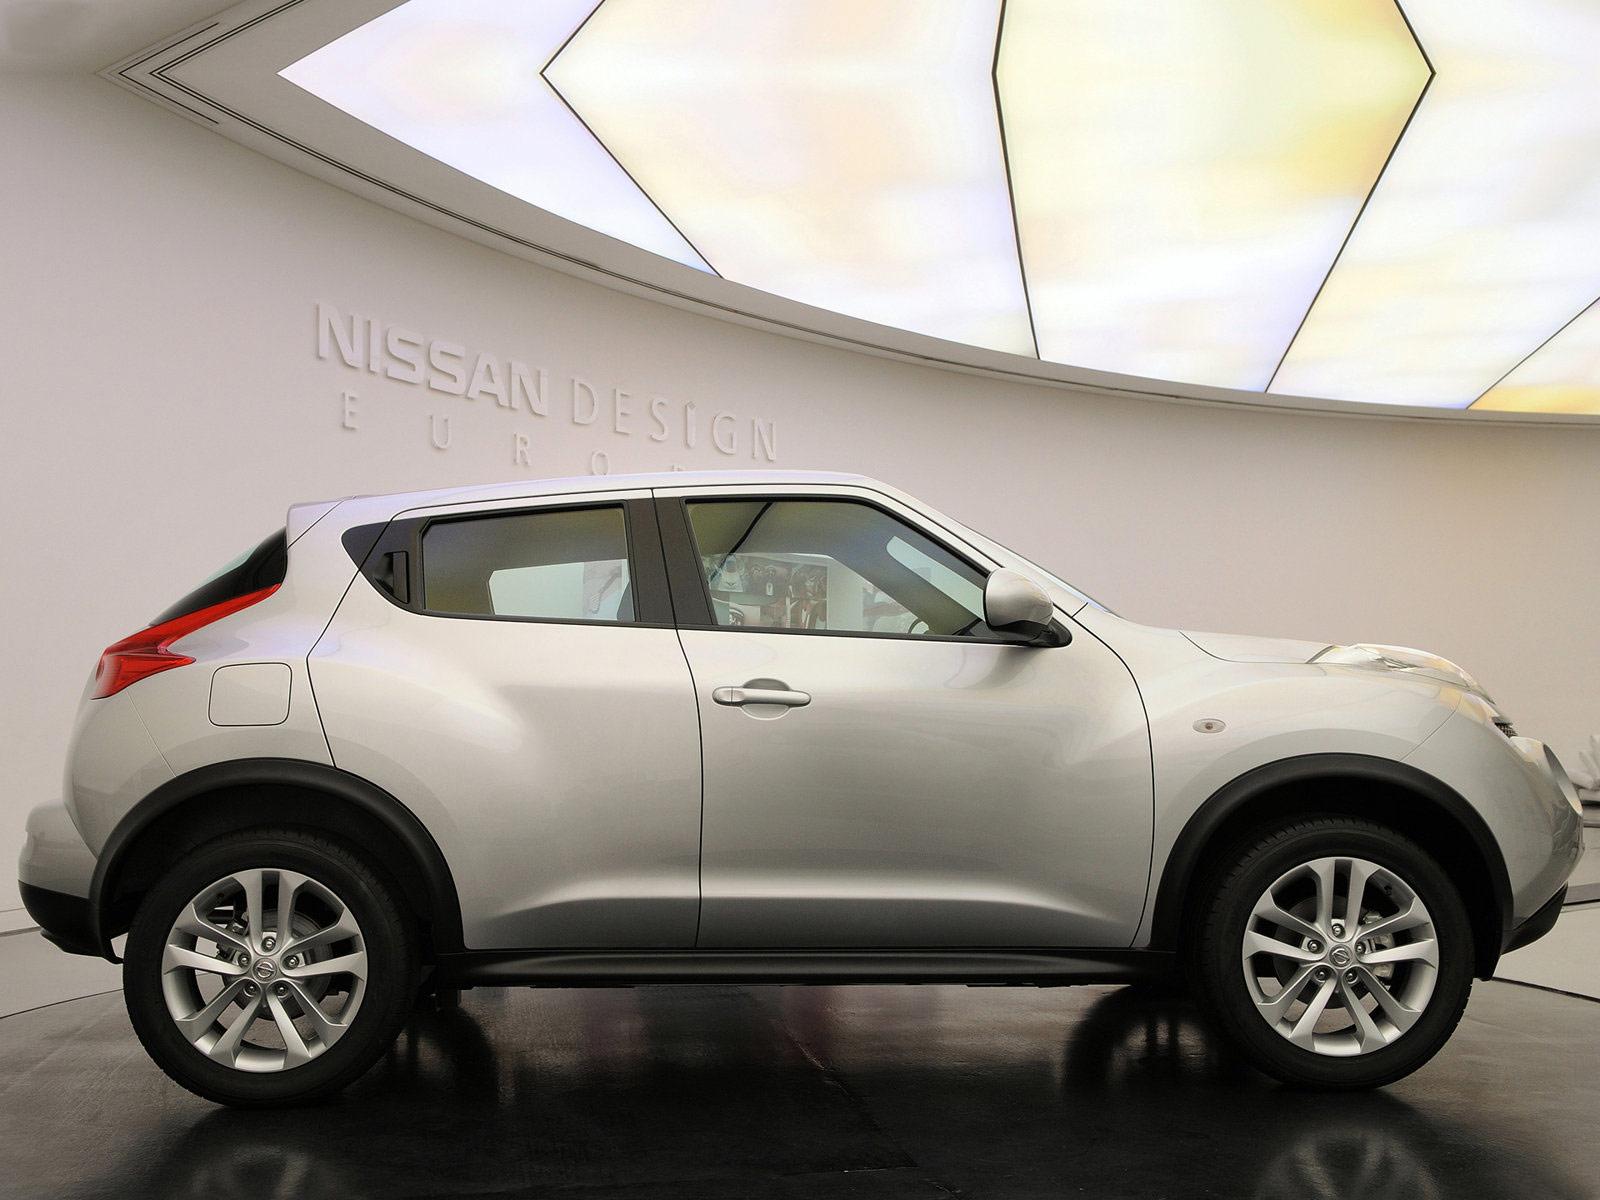 http://3.bp.blogspot.com/_LpVJVQkiYjc/S-YBG5grOjI/AAAAAAAABUo/qYU1nhuuhh0/s1600/Nissan-Juke_2011_japanese_car_pictures-18.jpg